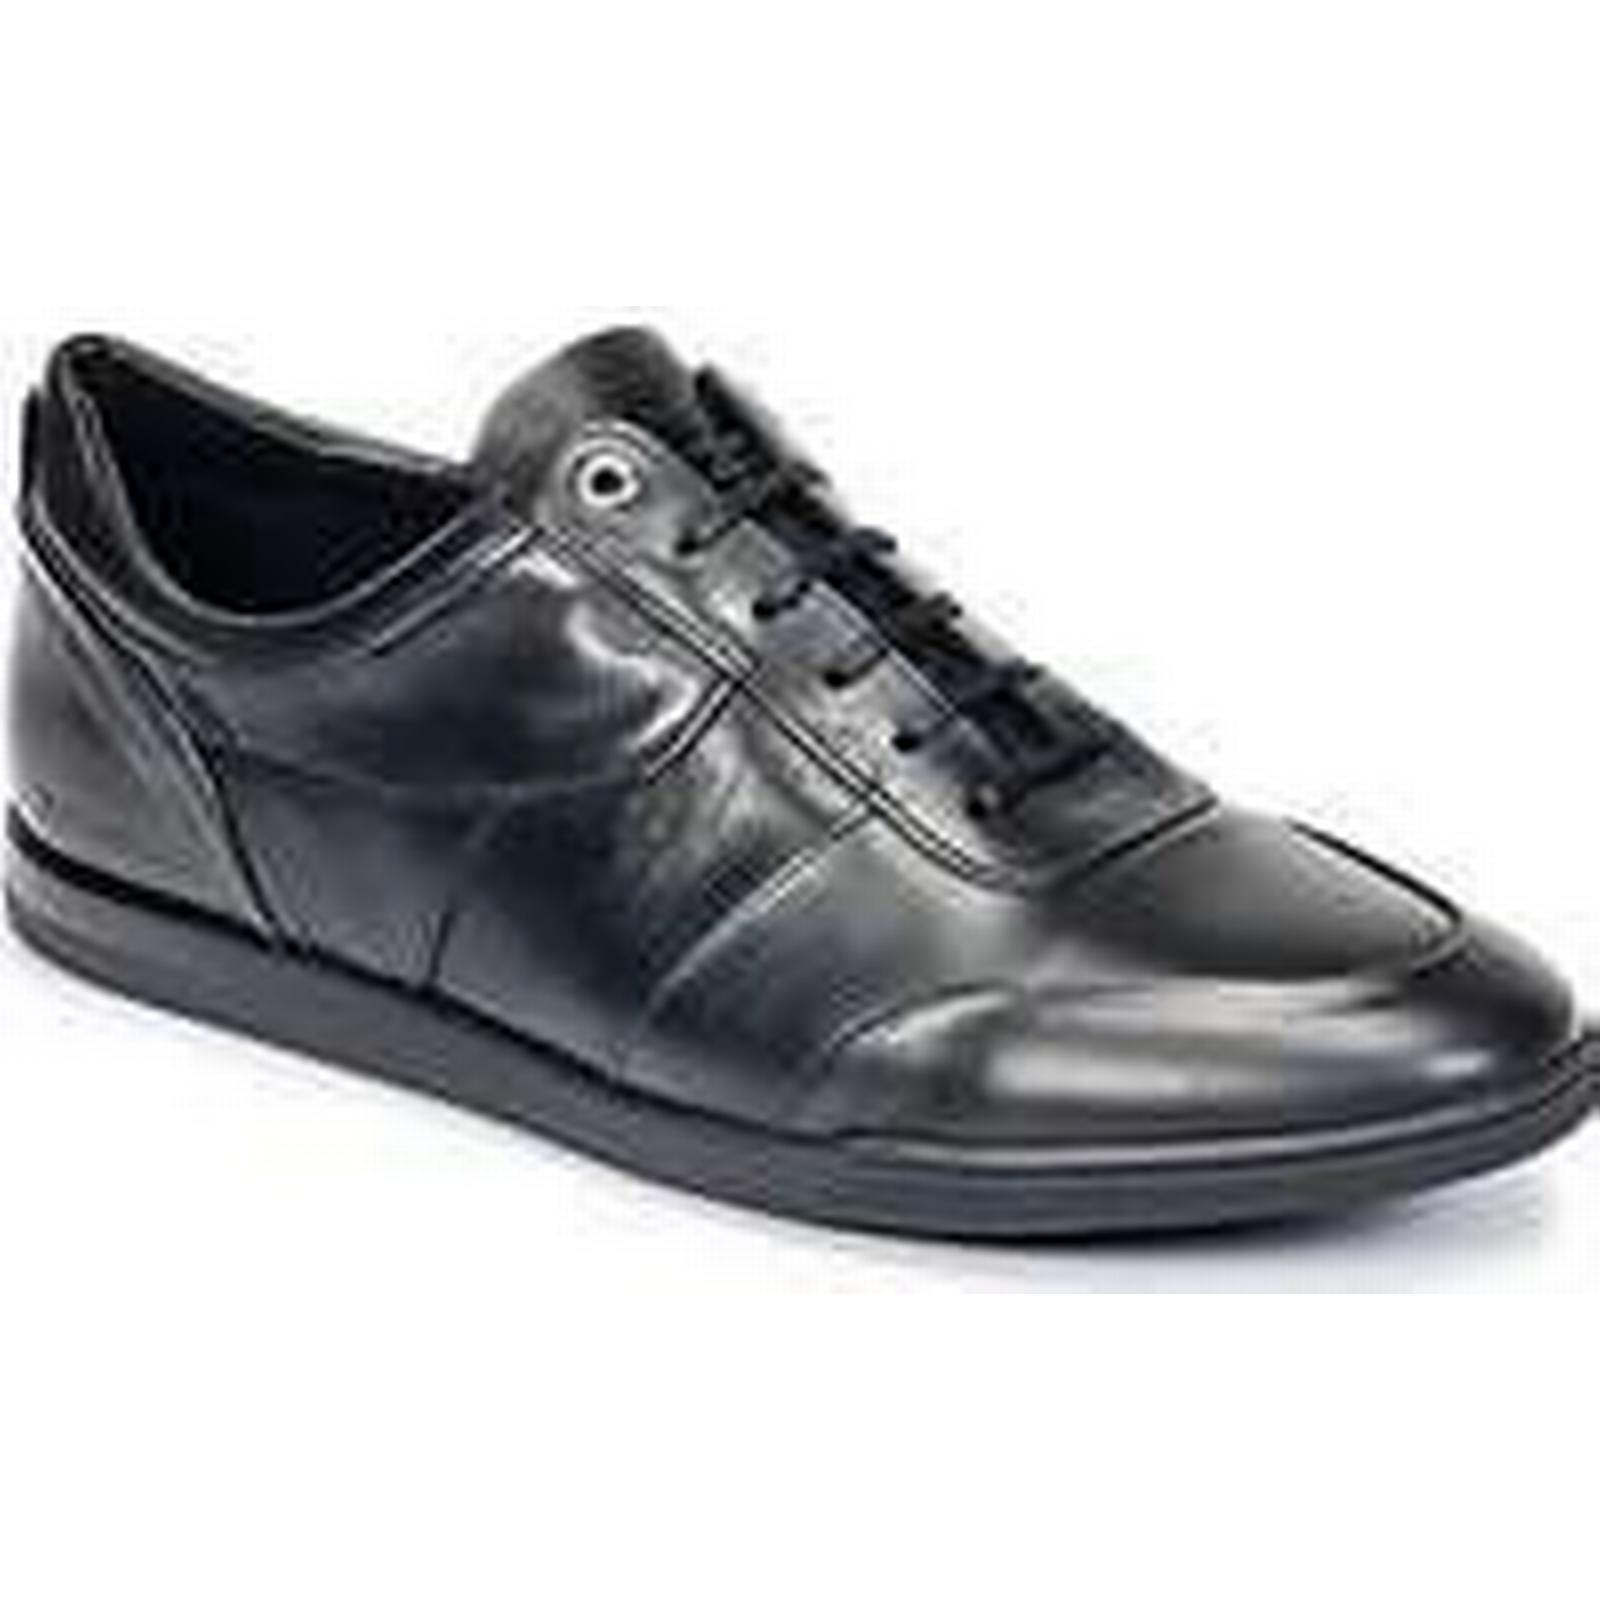 Spartoo.co.uk (Trainers) Redskins JOGO men's Shoes (Trainers) Spartoo.co.uk in Black 7c4ff9